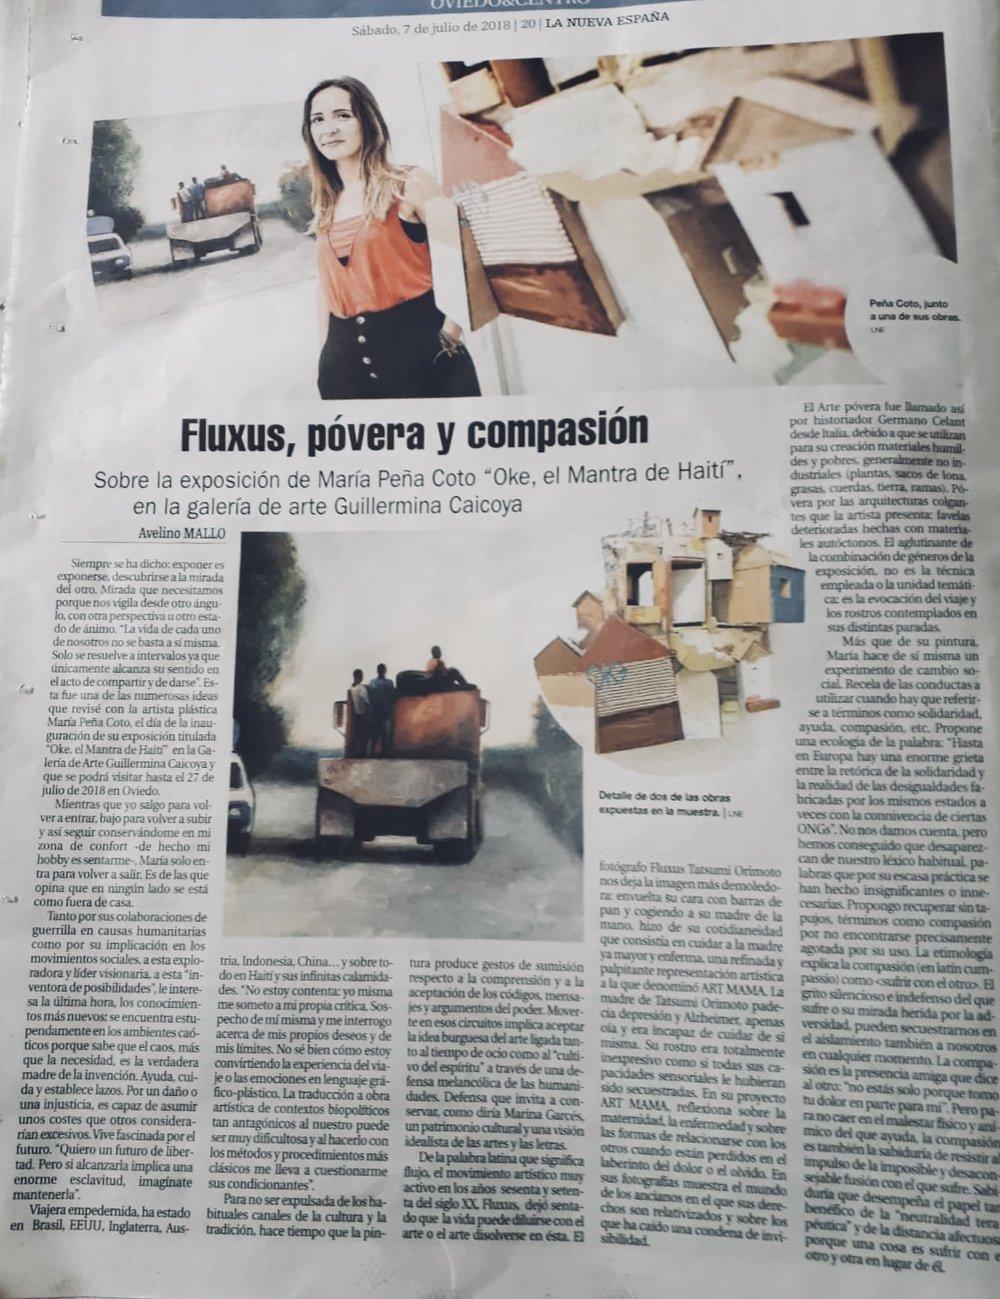 https://www.google.es/…/fluxus-povera-compasion/2314397.html